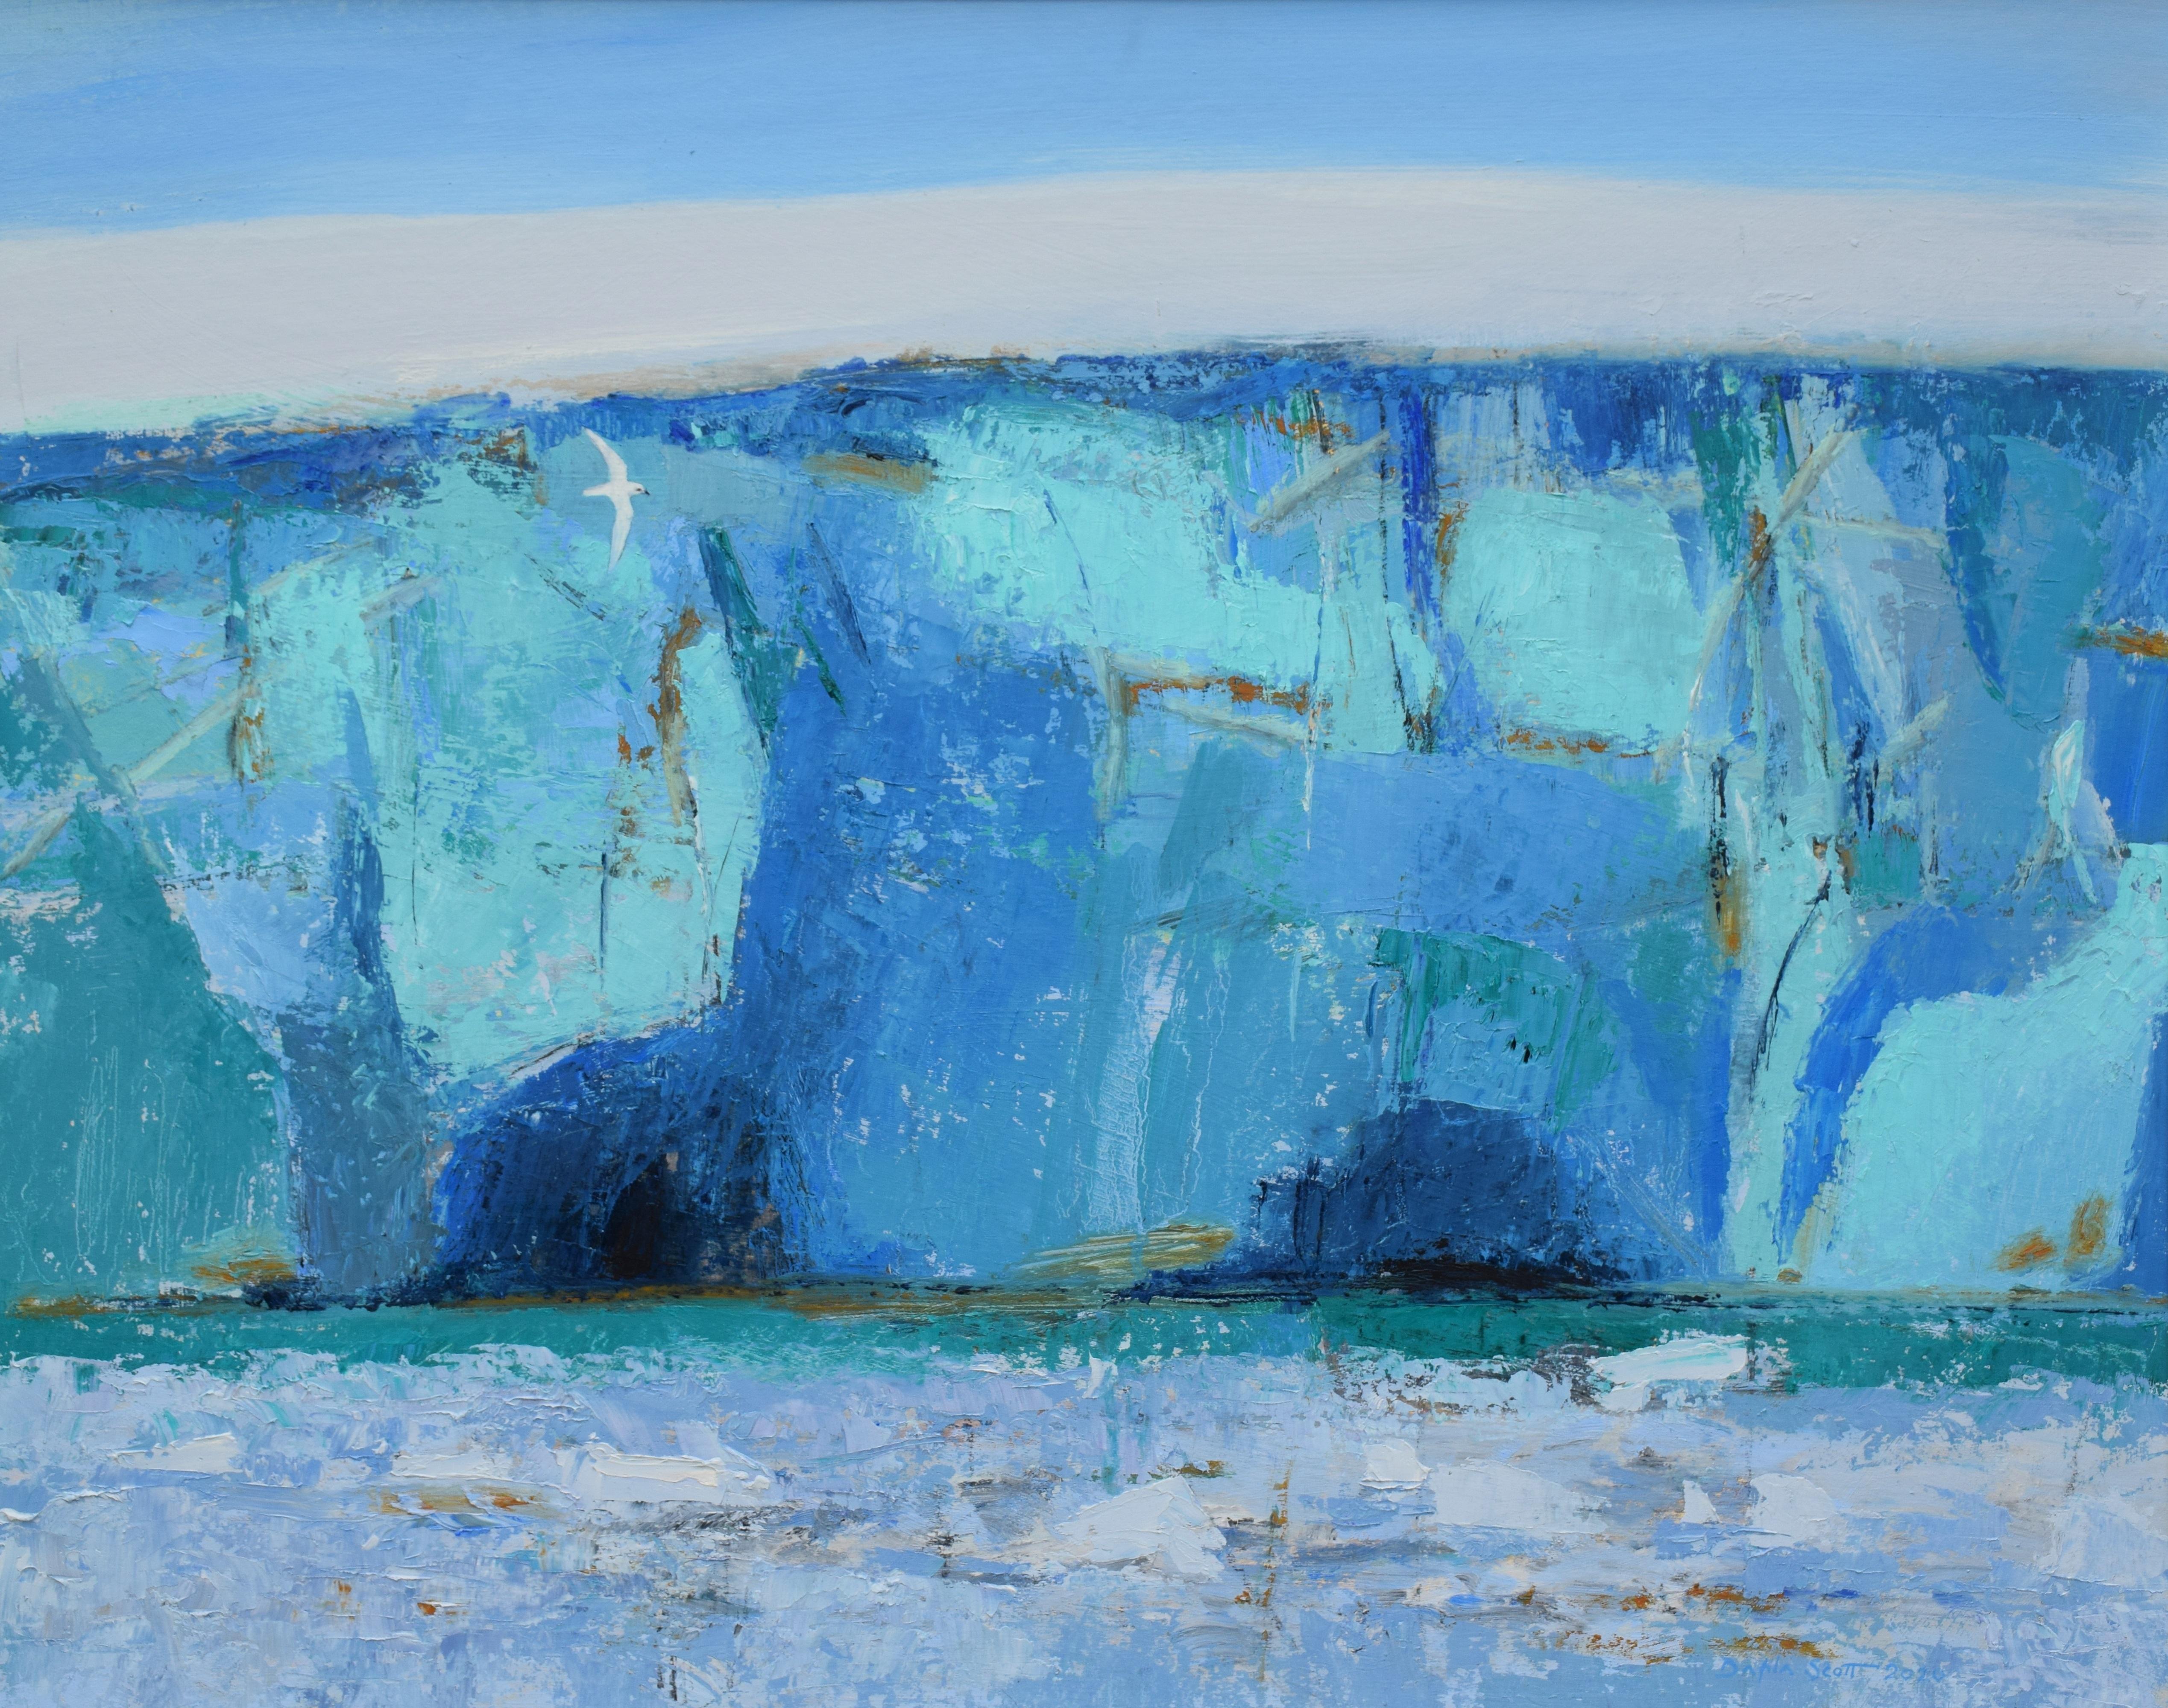 <p>Snoe Petrel and ice cliff by Dafila Scott</p>